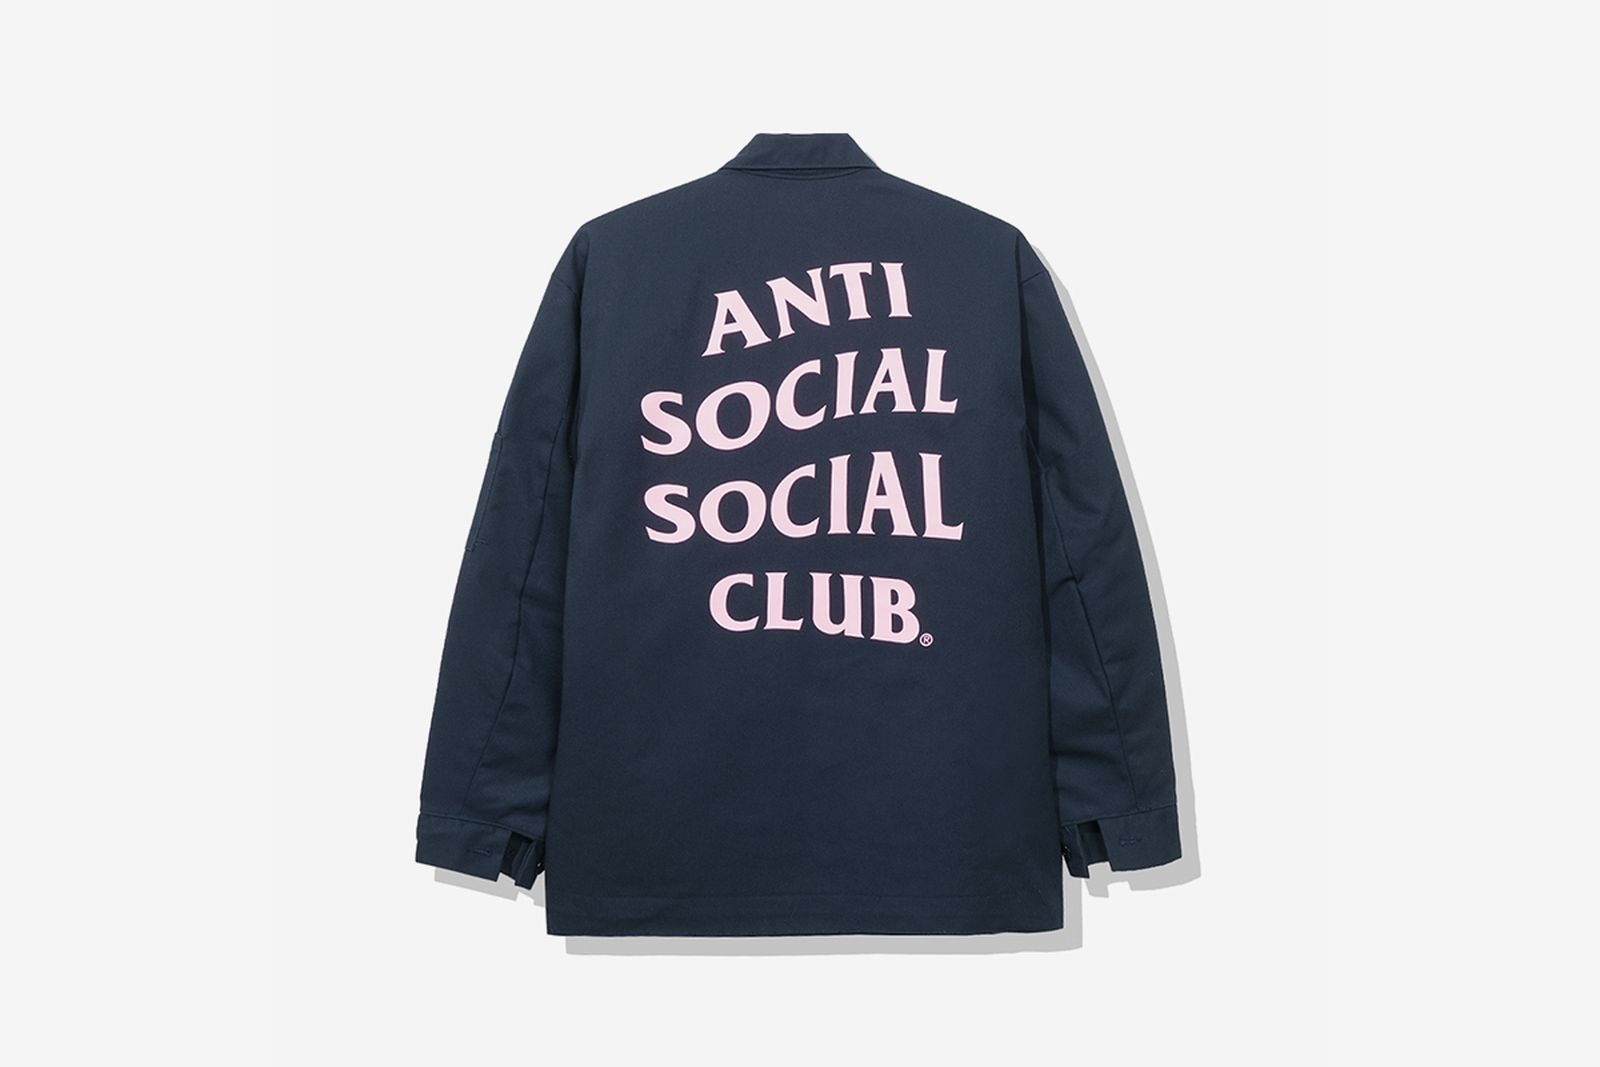 anti-social-social-club-usps-collaboration-2-03